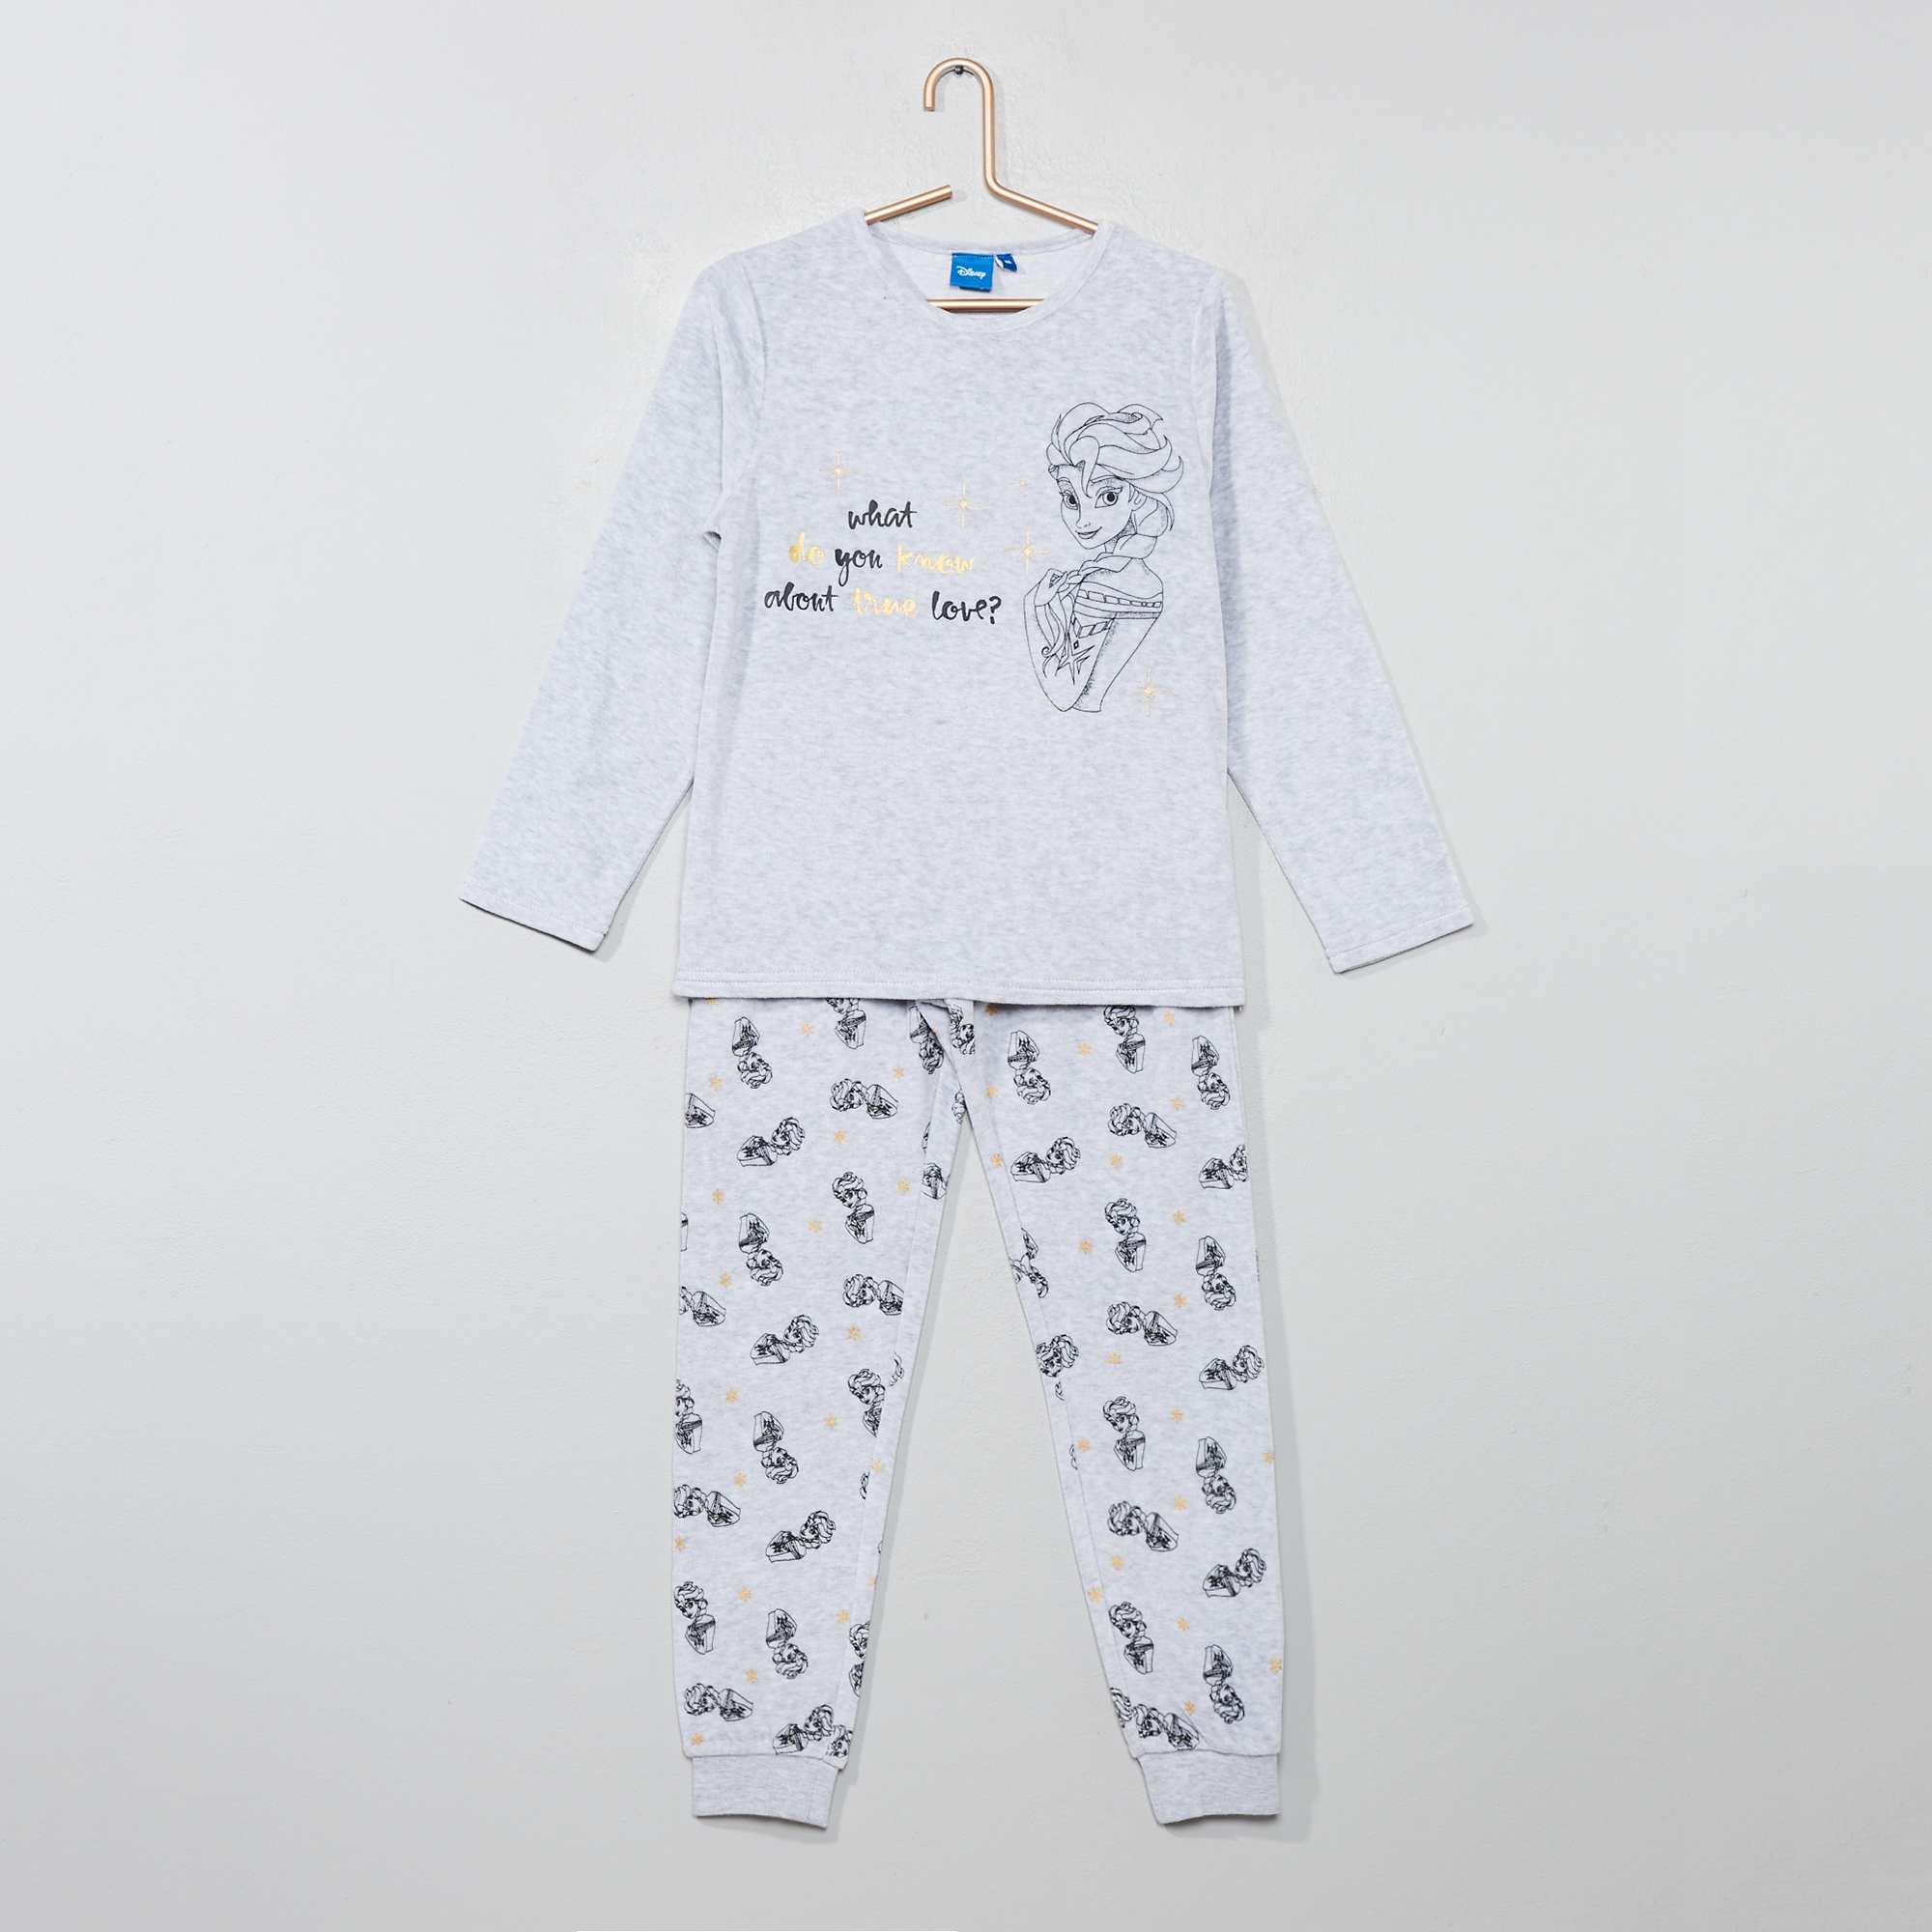 956b7b55ba762 Pyjama velours  La Reine des neiges  Fille - gris - Kiabi - 13